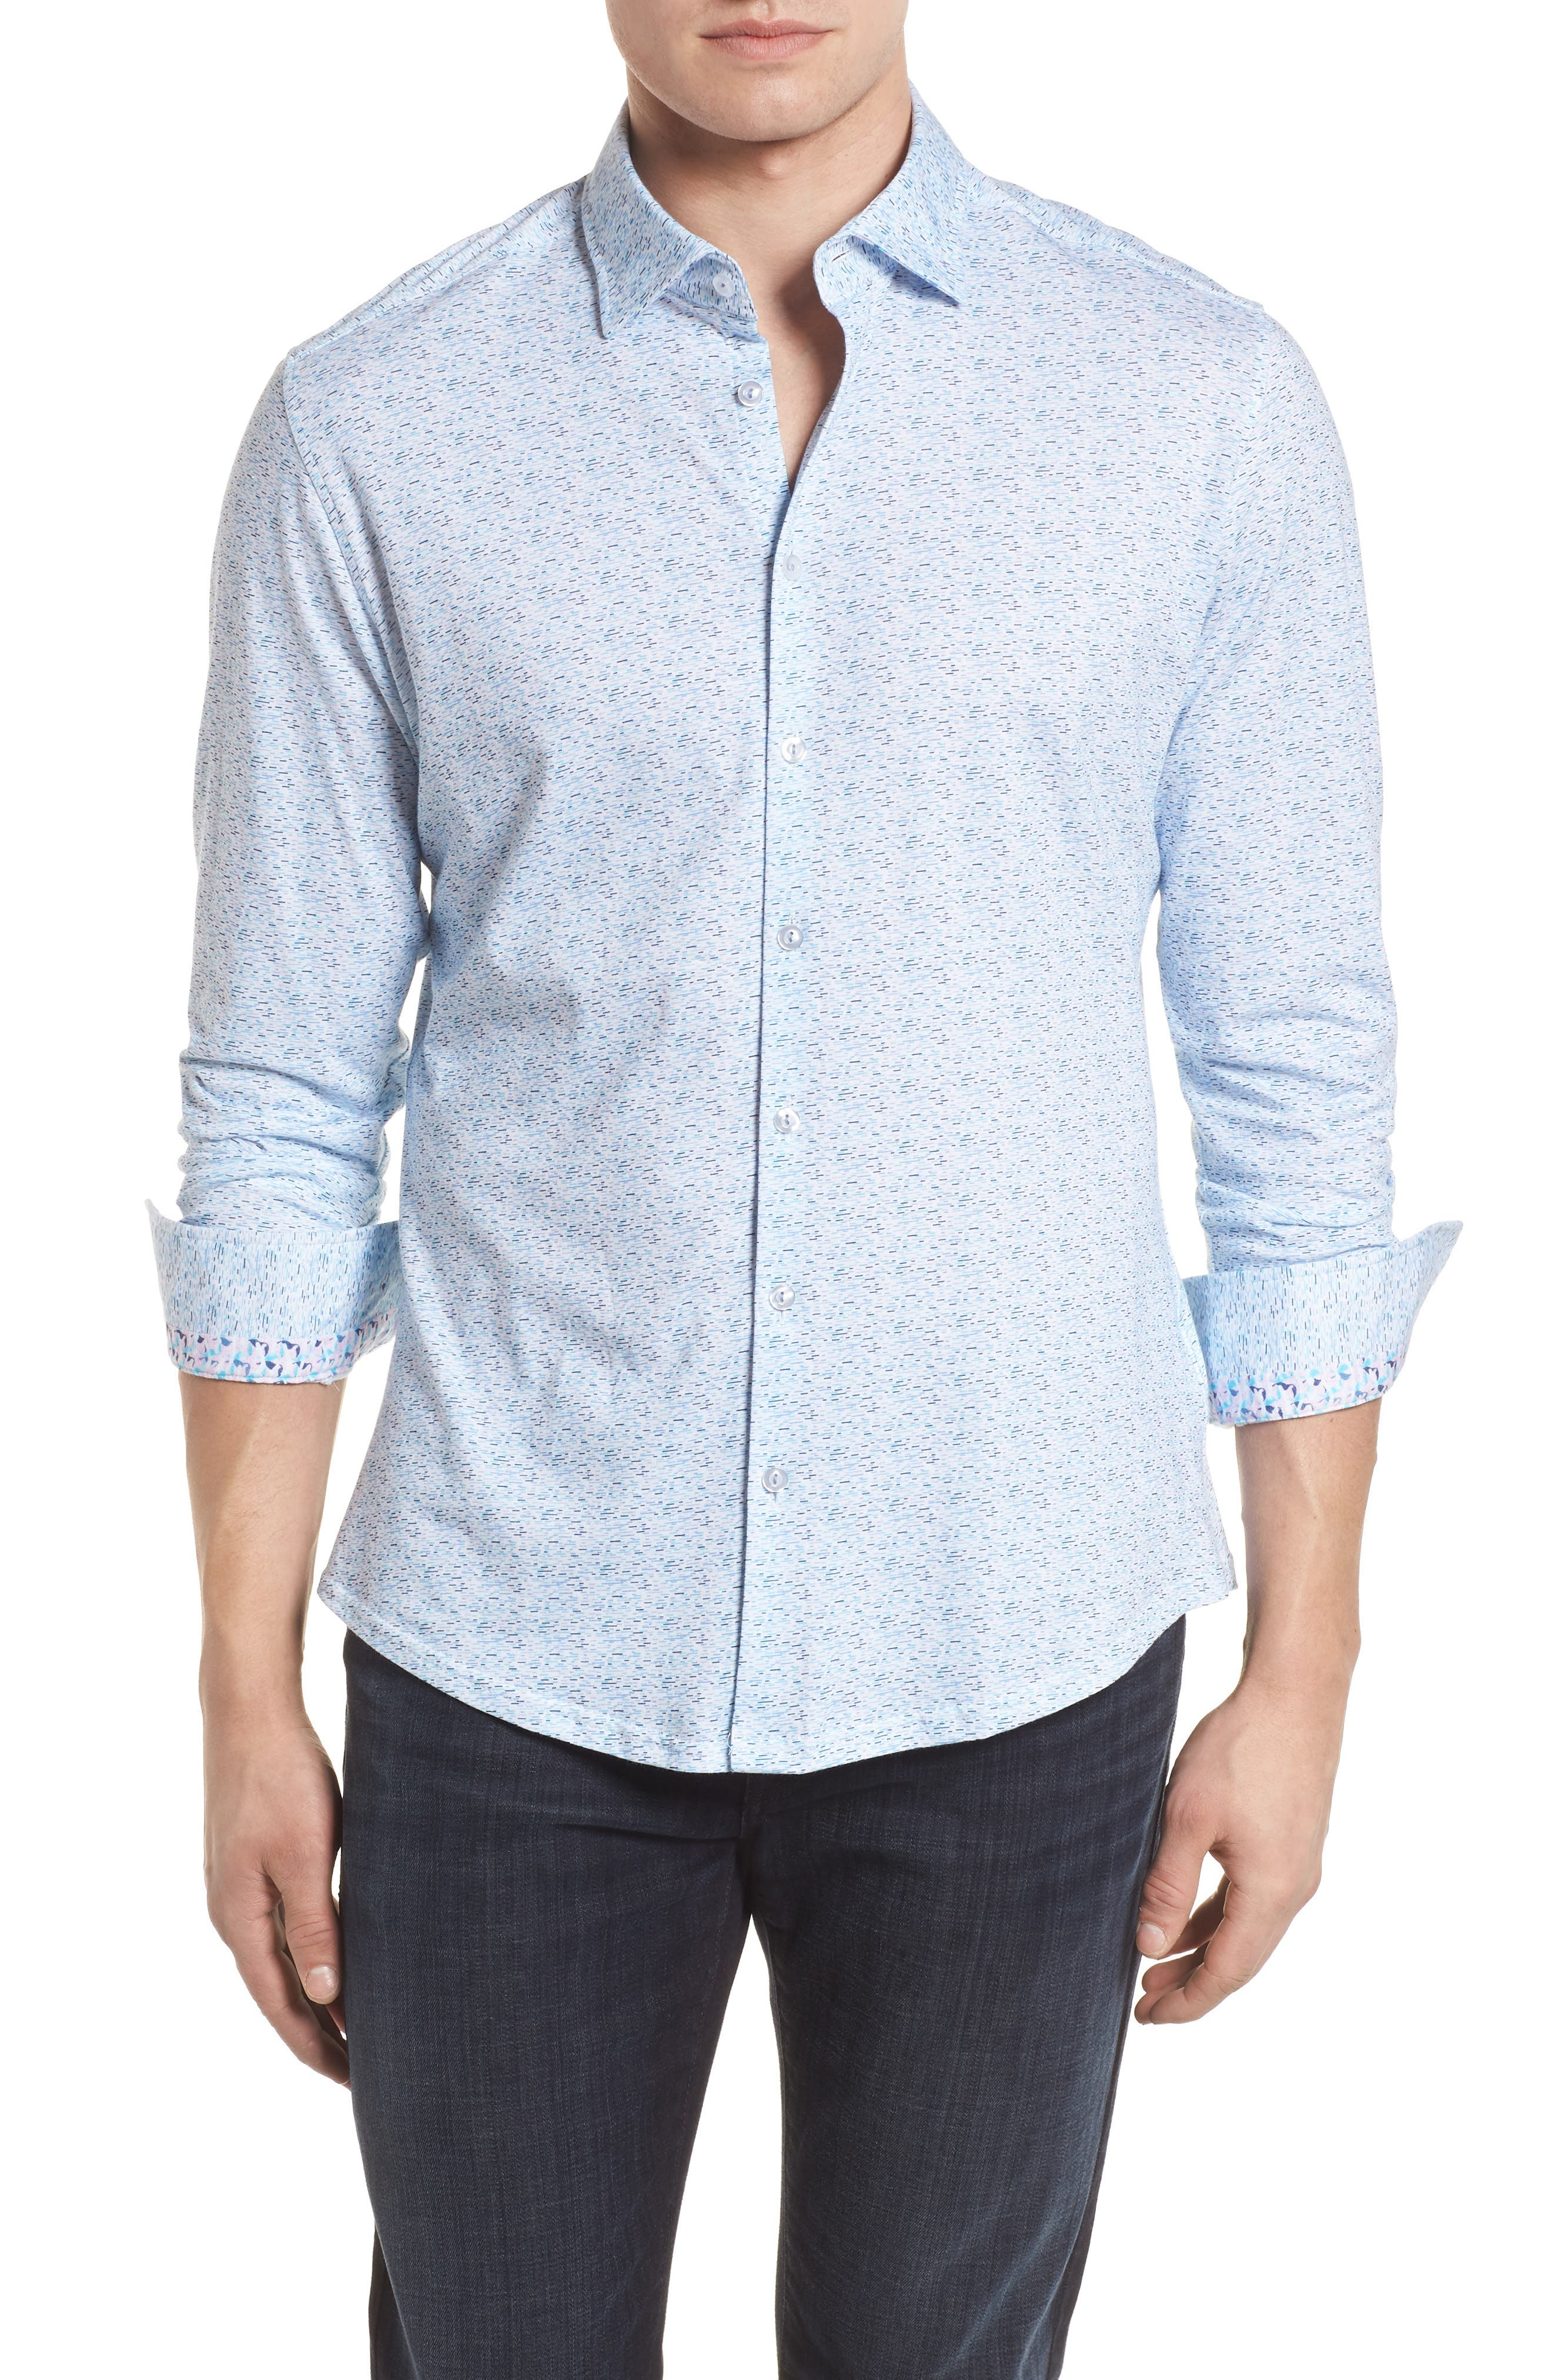 STONE ROSE,                             Contemporary Fit Print Sport Shirt,                             Main thumbnail 1, color,                             400